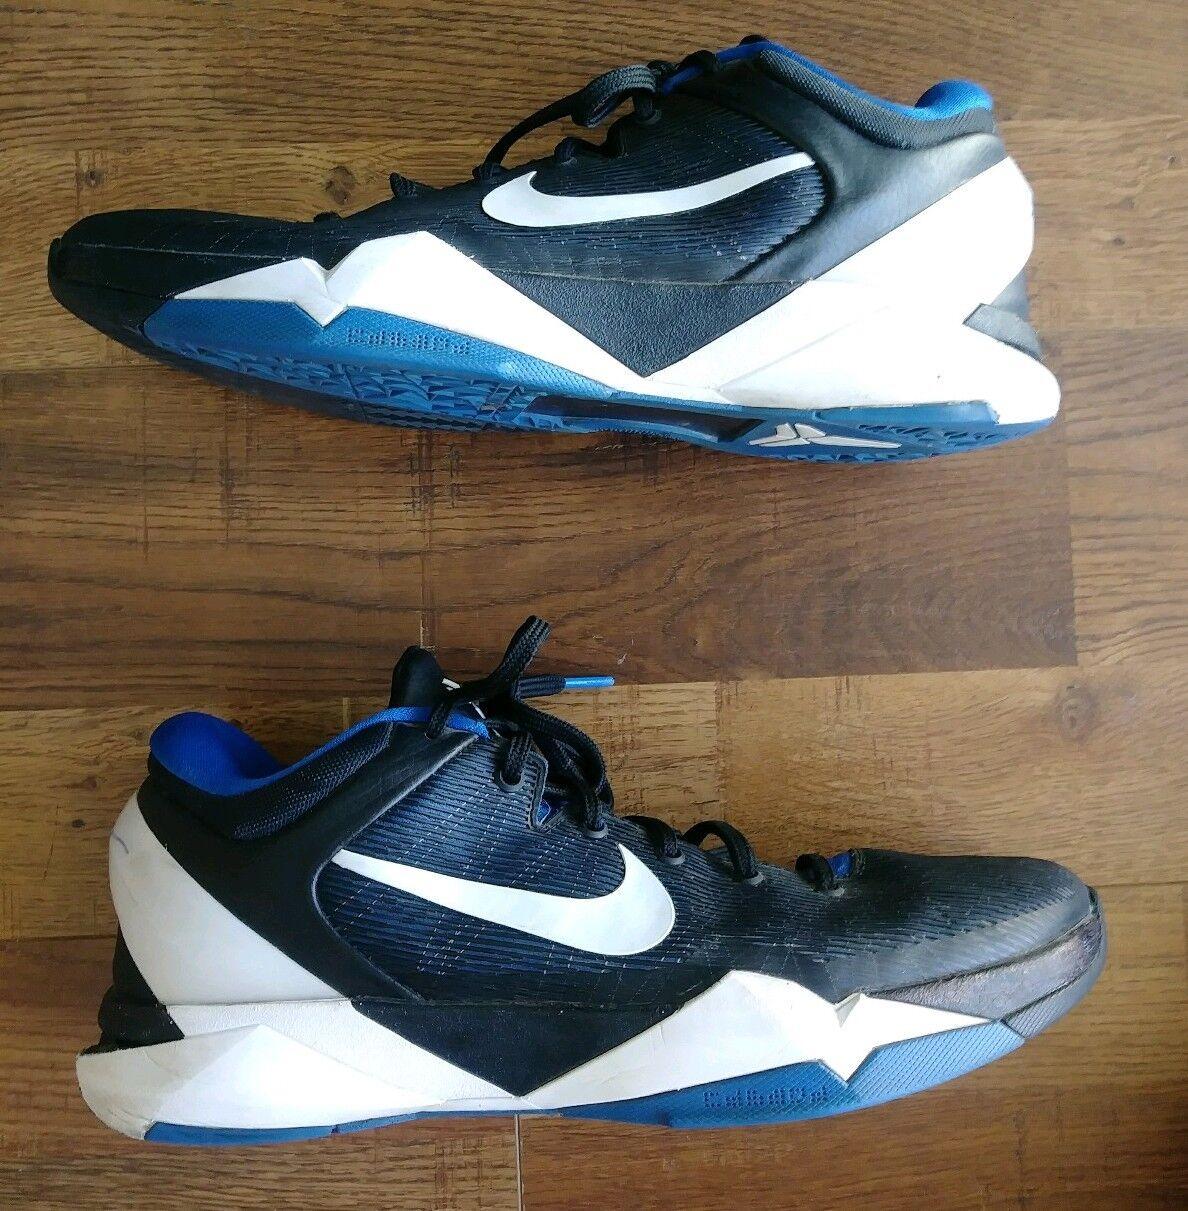 Nike Zoom Kobe 7 VII Duke Treasure blueee Black shoes Men's Size 11